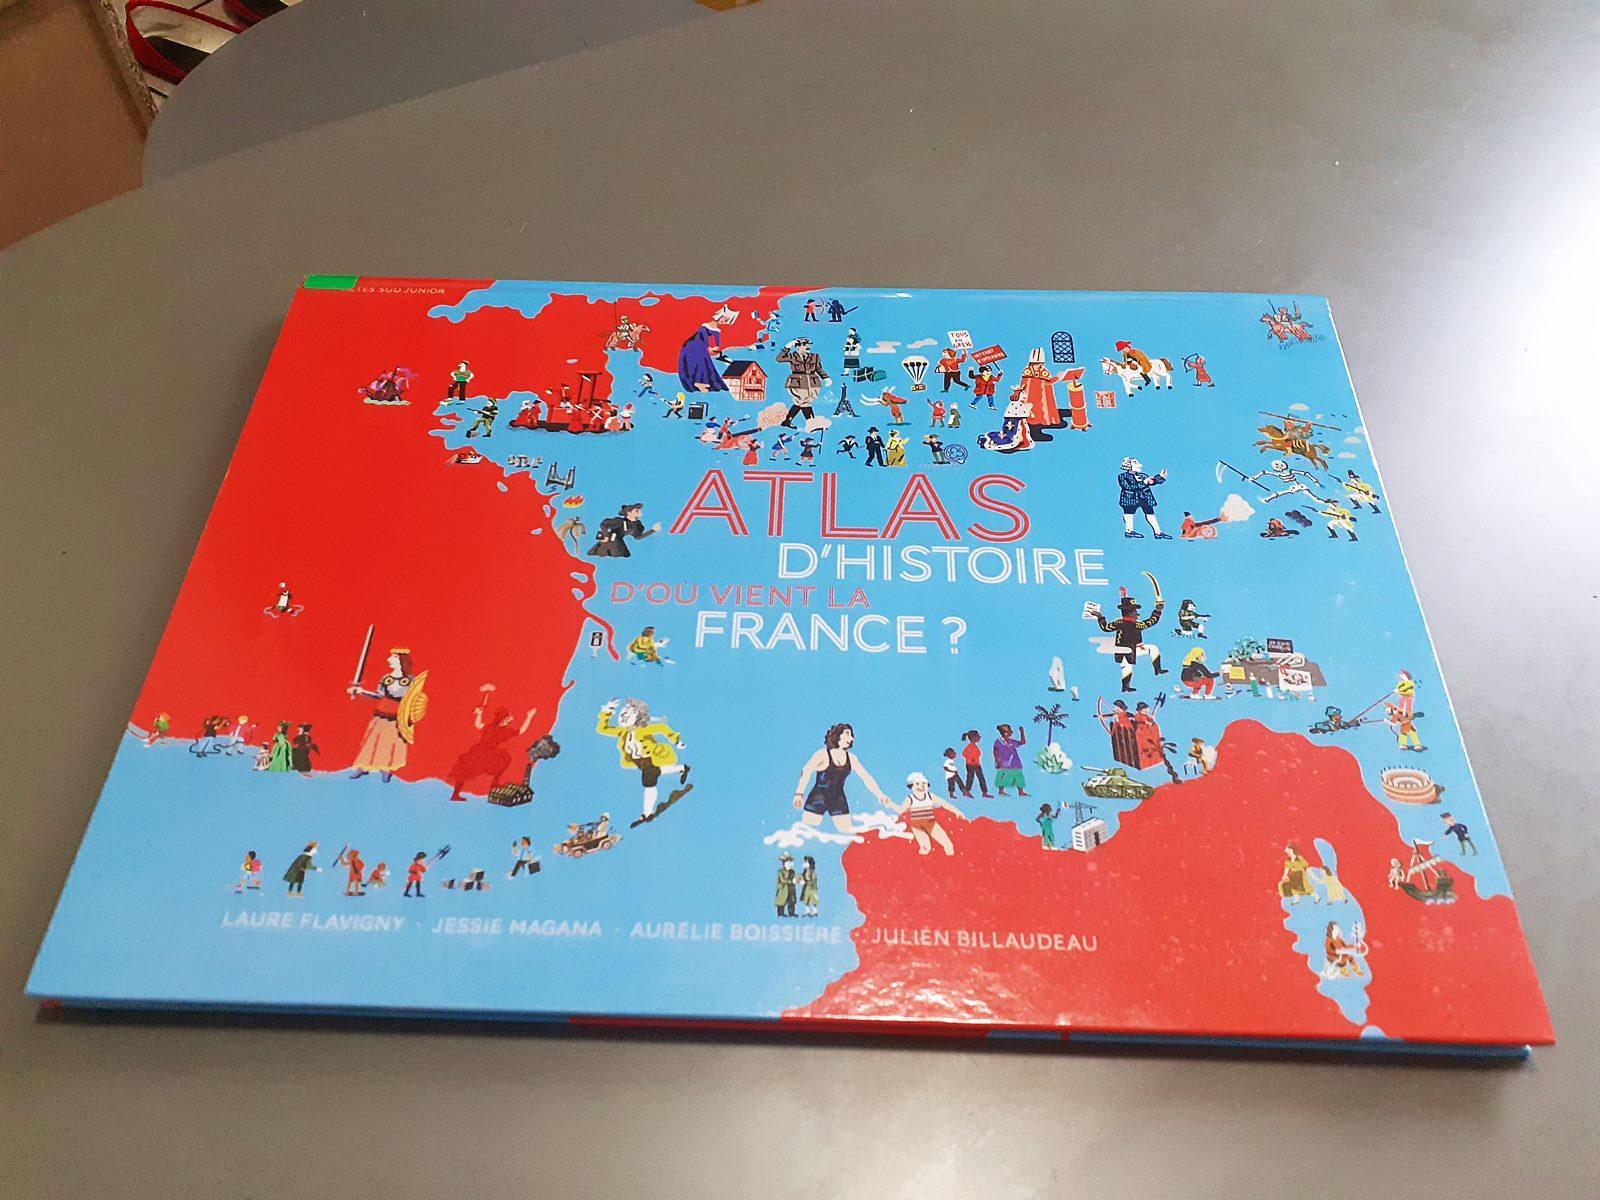 Atlas histoire france20210825 142728